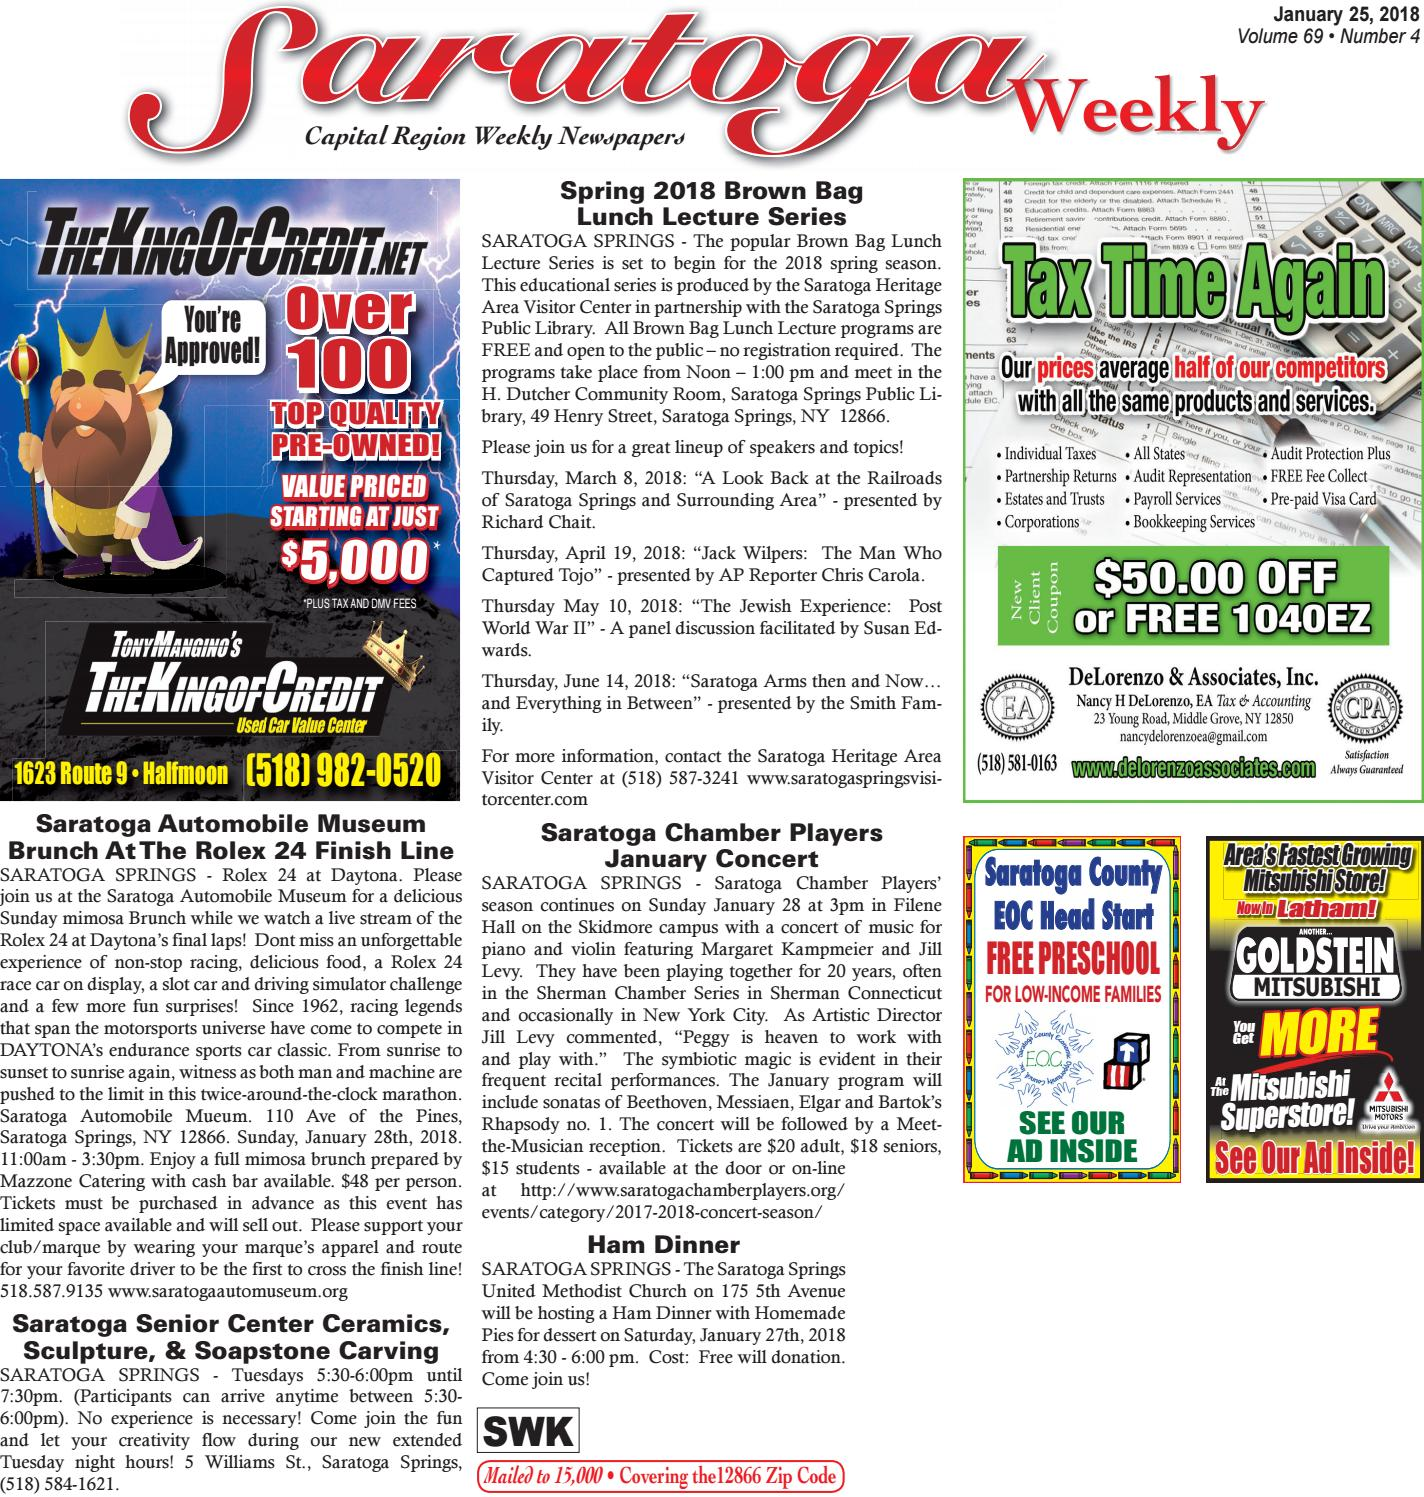 Saratoga Weekly 012518 by Capital Region Weekly Newspapers